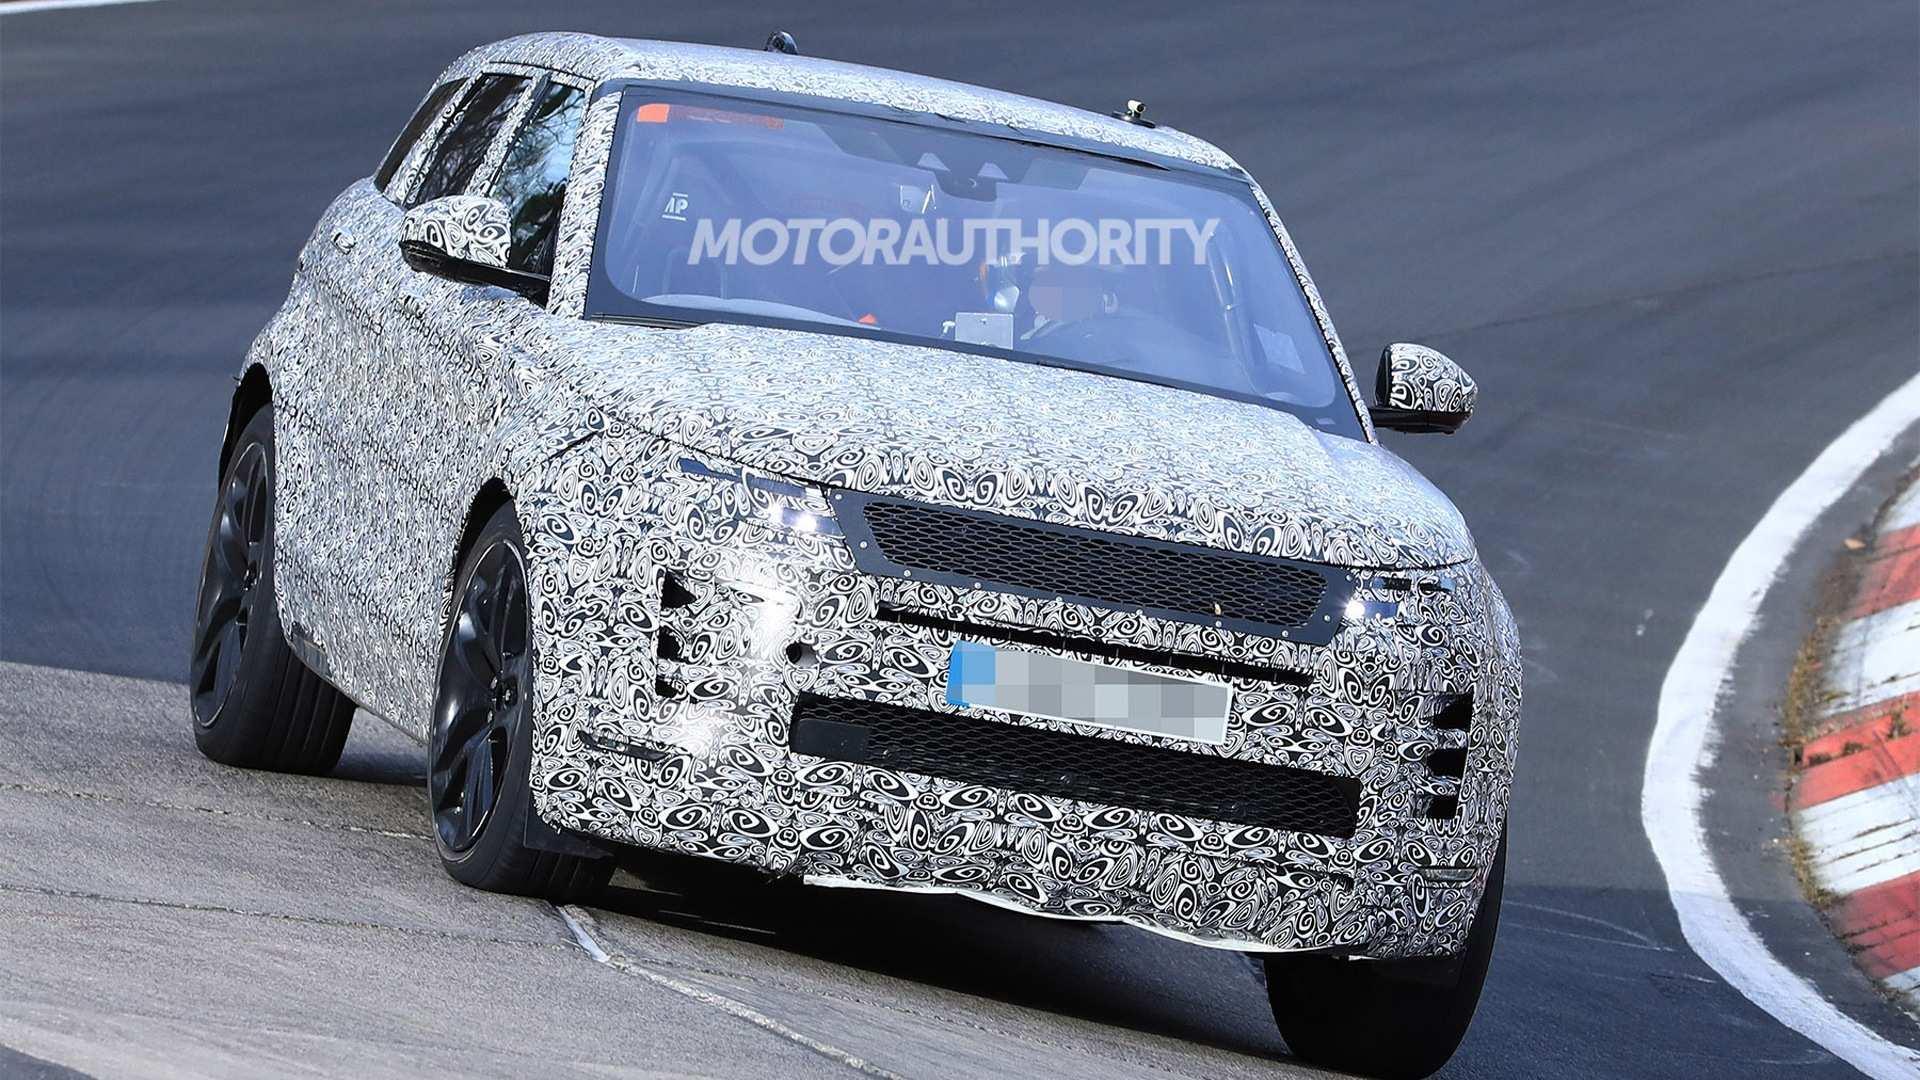 95 Concept of Jaguar Land Rover 2020 Review for Jaguar Land Rover 2020